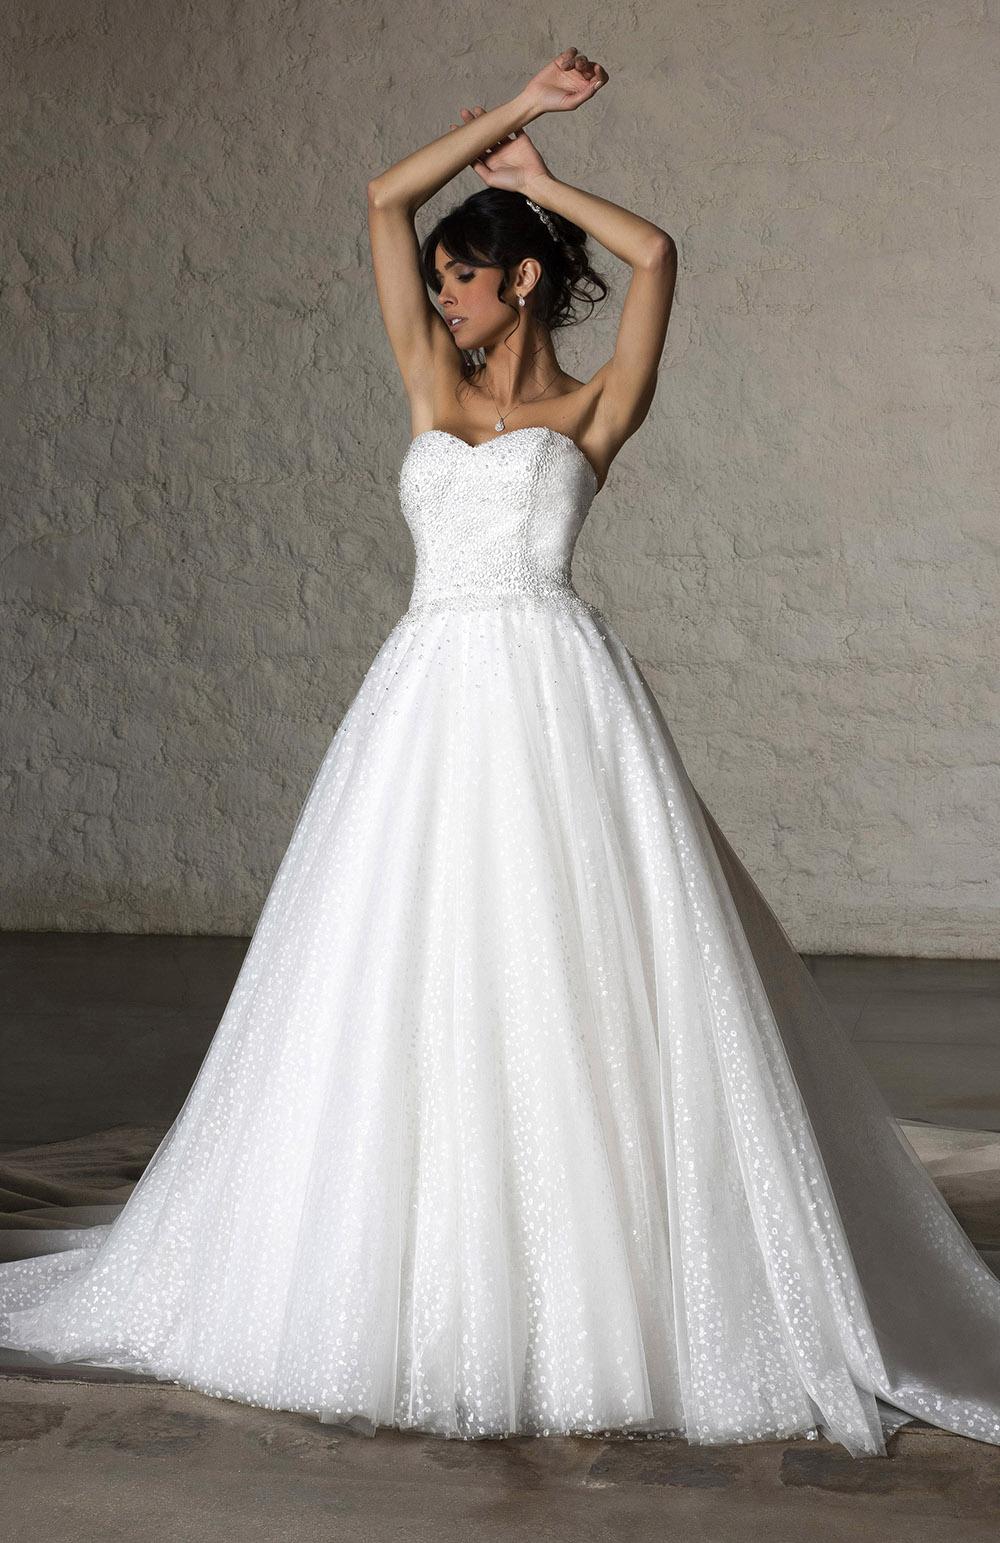 Robe de mariée Modèle Chany